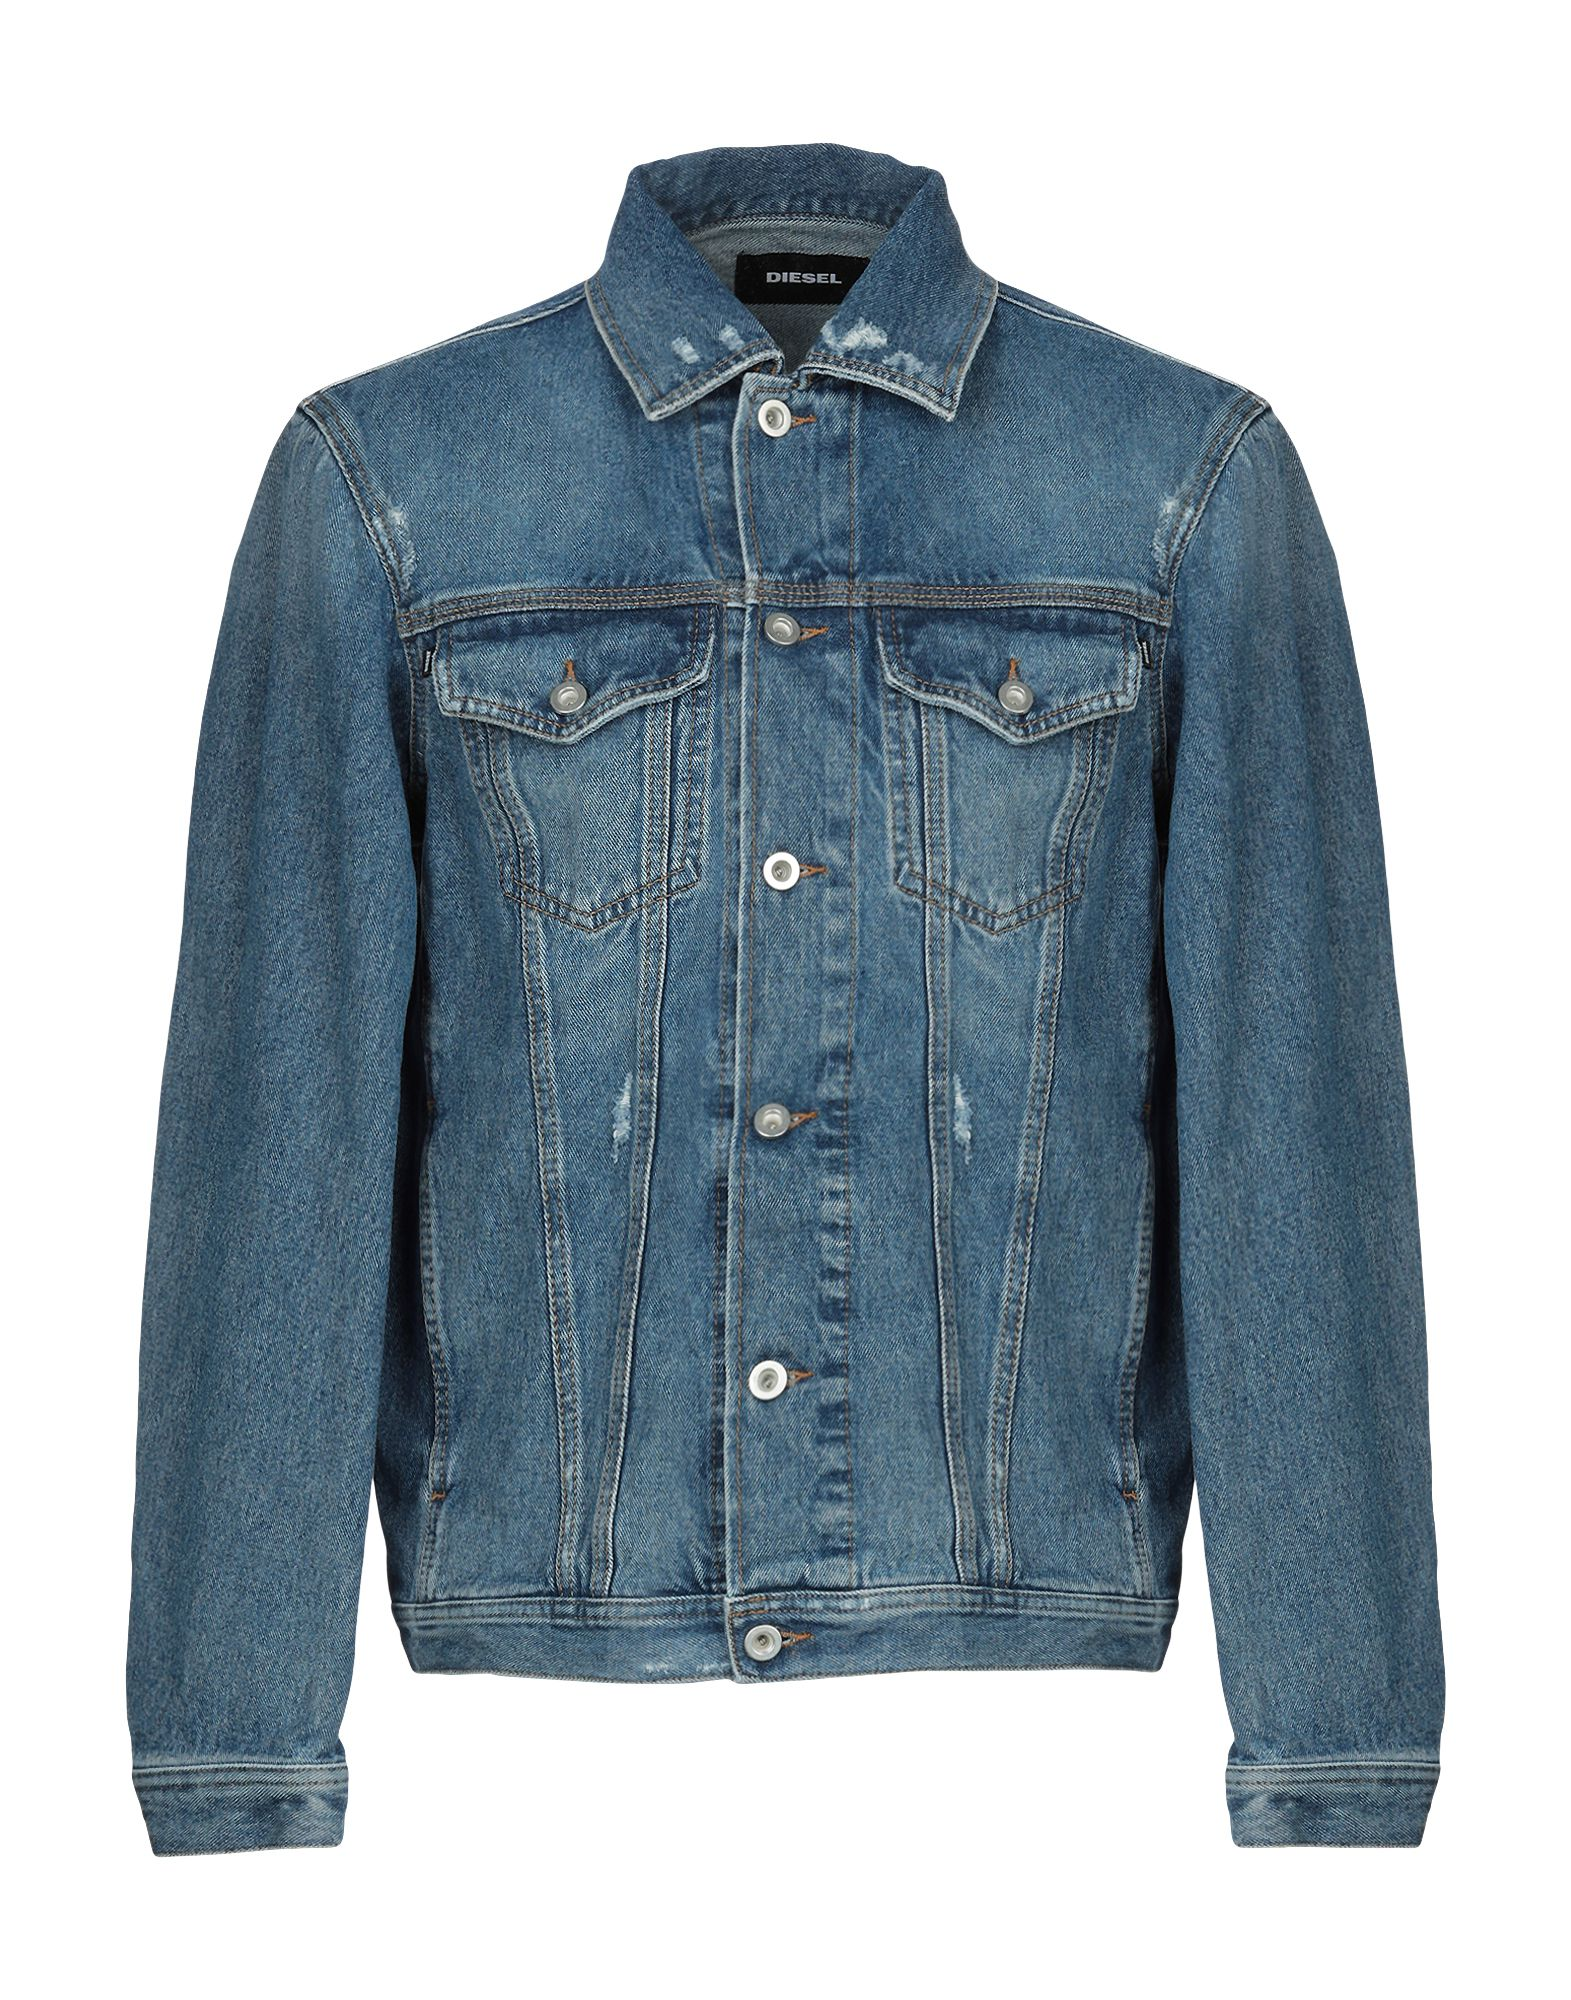 DIESEL Джинсовая верхняя одежда le volière джинсовая верхняя одежда